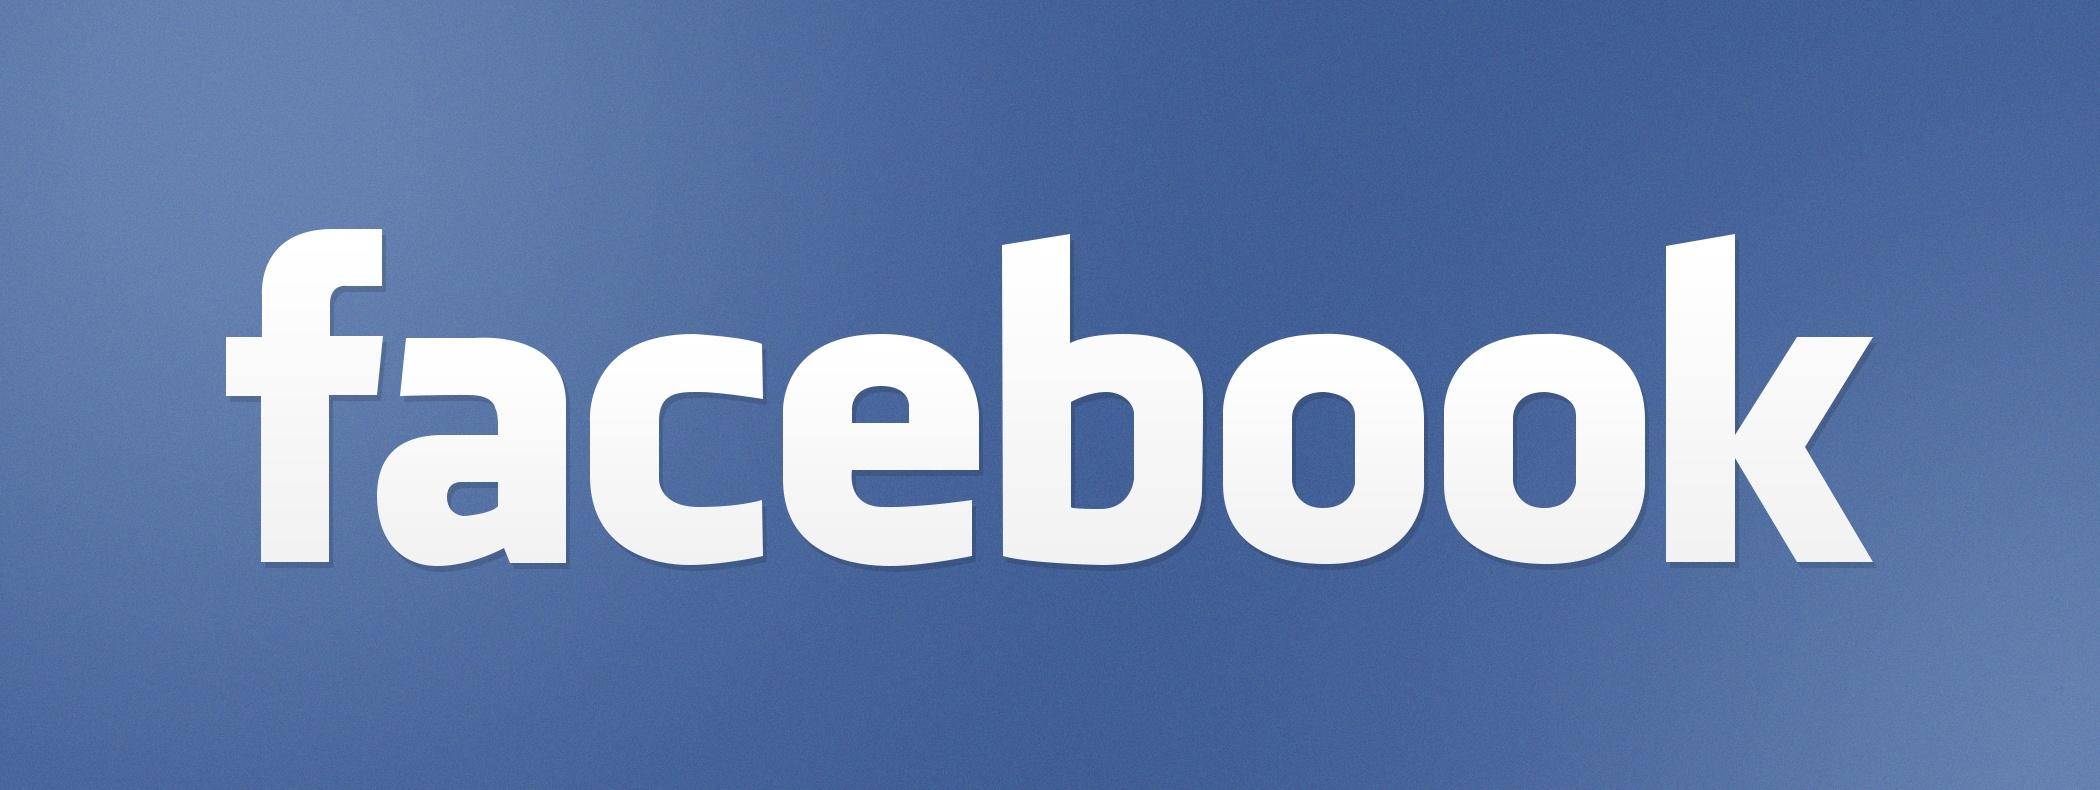 "Facebook_logo-6 ""width ="" 768 ""height ="" 289 ""srcset ="" https://blogging-techies.com/wp-content/uploads/2020/04/1587781221_999_Como-el-color-afecta-a-las-marcas-los-anuncios-graficos.jpg 2100w, https: // www. disruptivestatic.com/wp-content/uploads/2015/07/Facebook_logo-6-300x113.jpg 300w, https://www.disruptivestatic.com/wp-content/uploads/2015/07/Facebook_logo-6-1500x564.jpg 1500w ""tamaños ="" (ancho máximo: 768px) 100vw, 768px ""></p><div class='code-block code-block-6' style='margin: 8px auto; text-align: center; display: block; clear: both;'> <div data-ad="